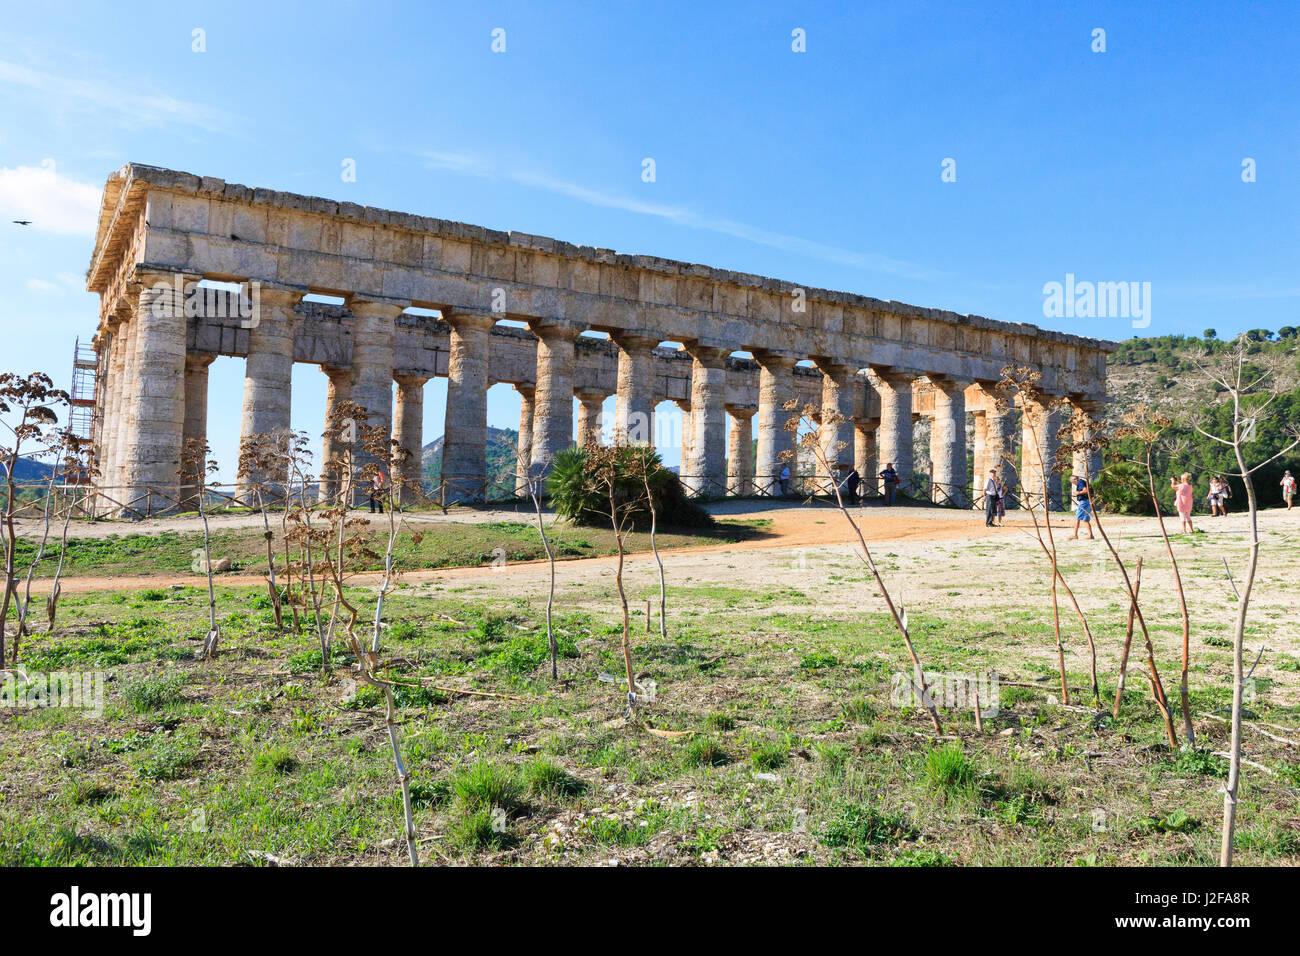 Dorian Temple of Segesta. 5th Century BC. Sicily, Italy - Stock Image